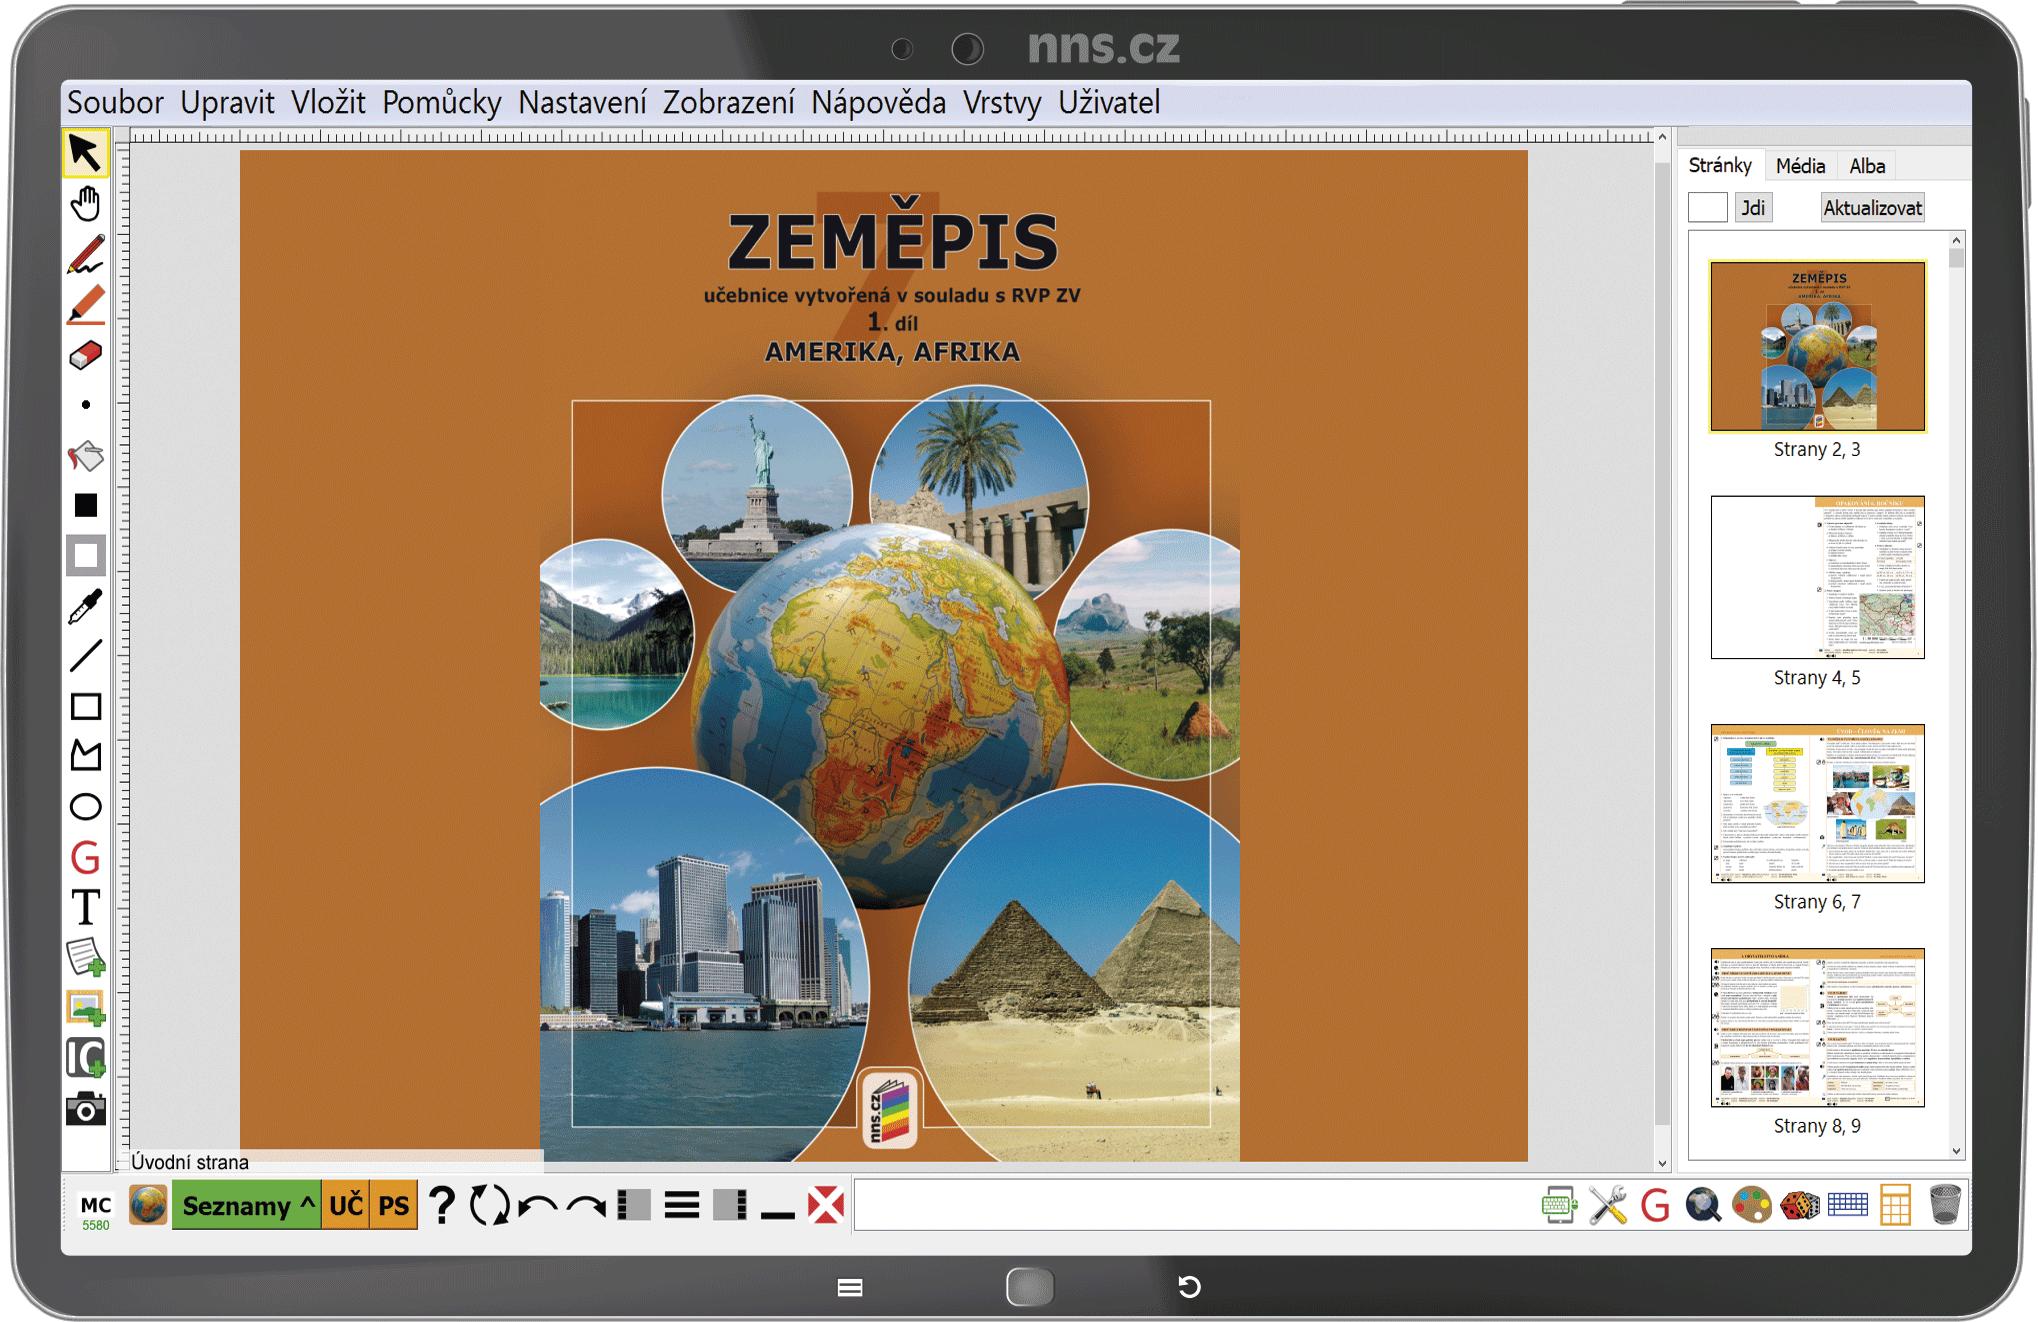 MIUč+ Zeměpis 7, 1. díl - Amerika, Afrika - žák. licence na 1 šk. rok